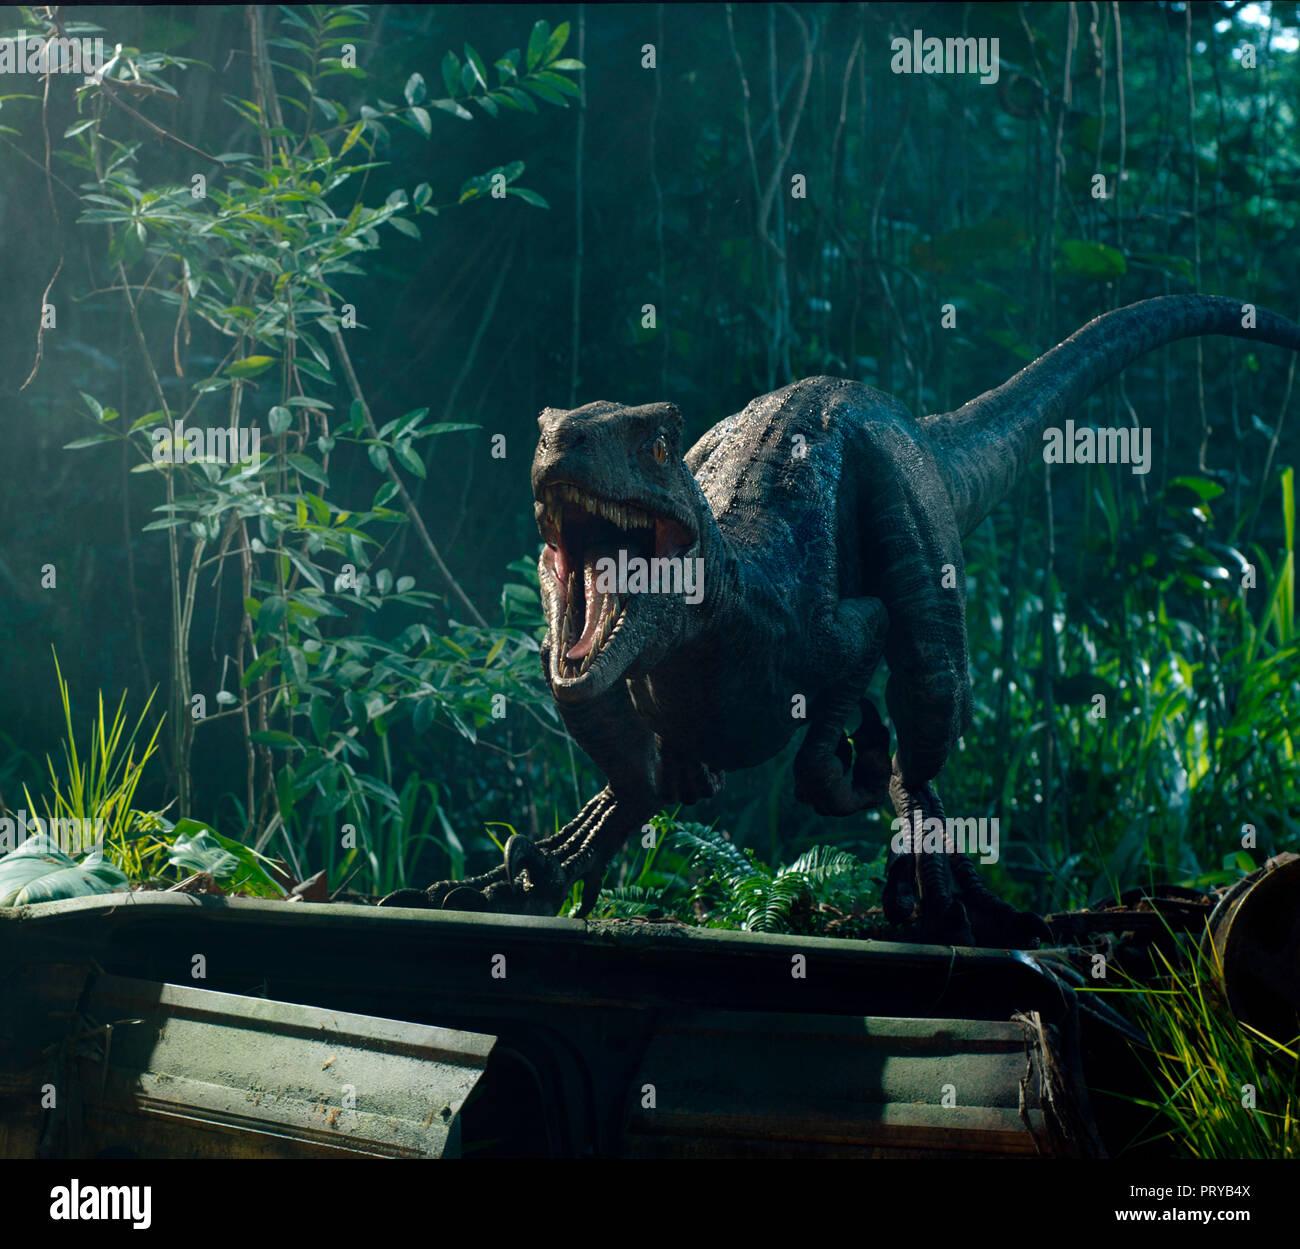 Prod DB © Universal Pictures - Amblin Entertainment - Legendary Entertainment - Apaches Entertainment / DR JURASSIC WORLD: FALLEN KINGDOM de J.A. Bayo Stock Photo